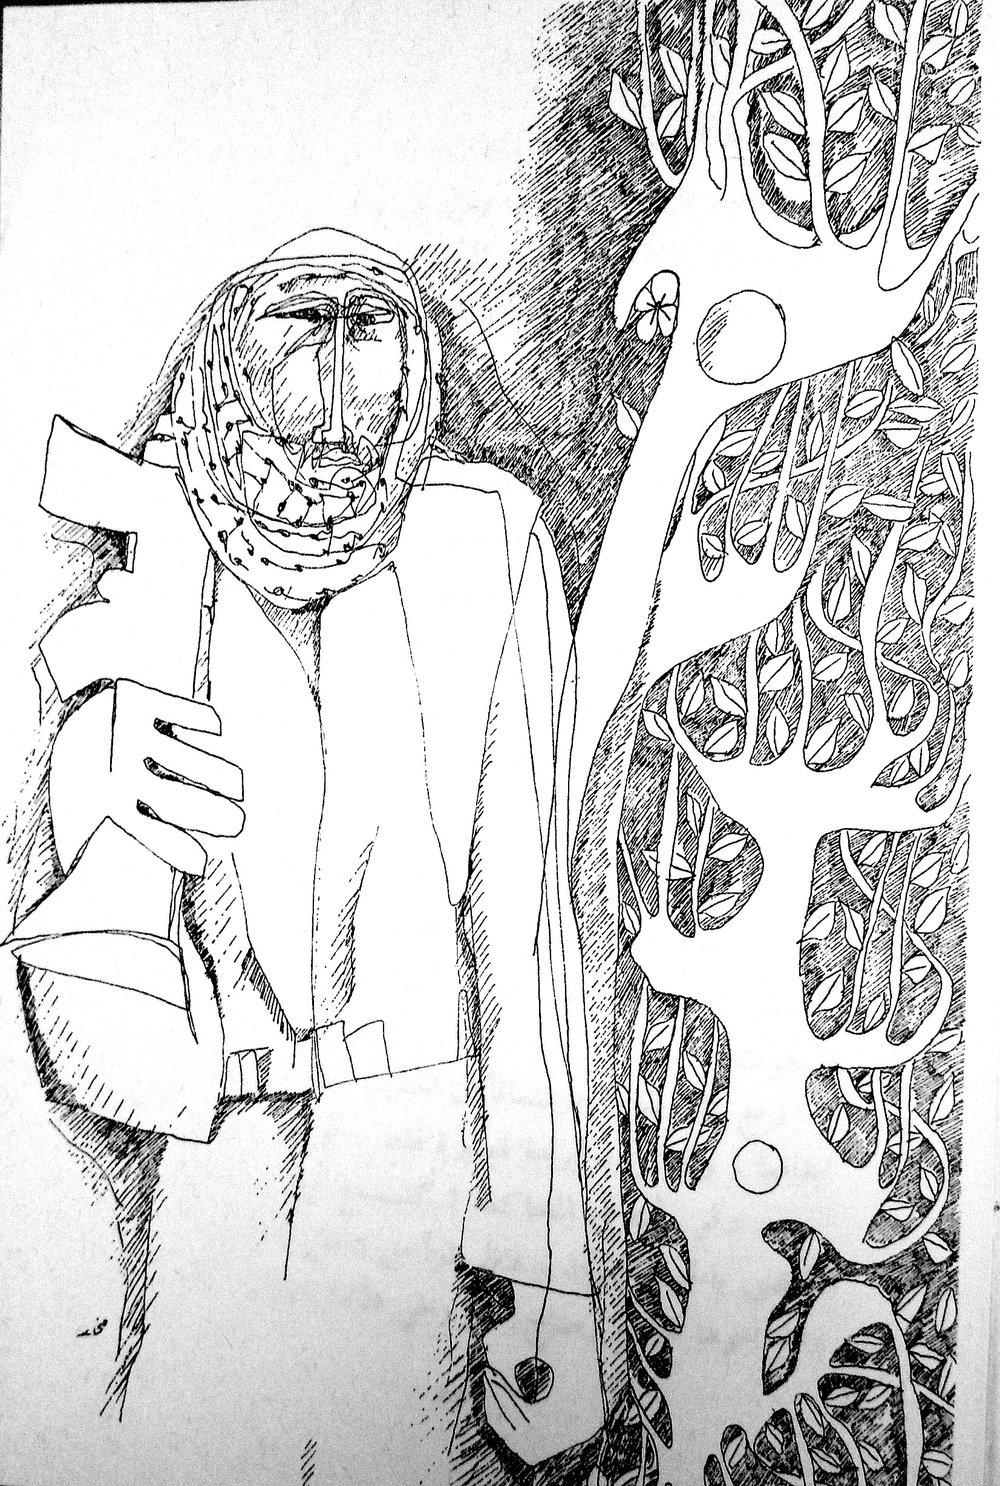 Fifth in a series by Mona Saudi, in Ghassān Kanafānī's  al-Āthār al-kāmilah , Vol. 1 (Beirut: Dār al-Ṭalīʿah, 1972).